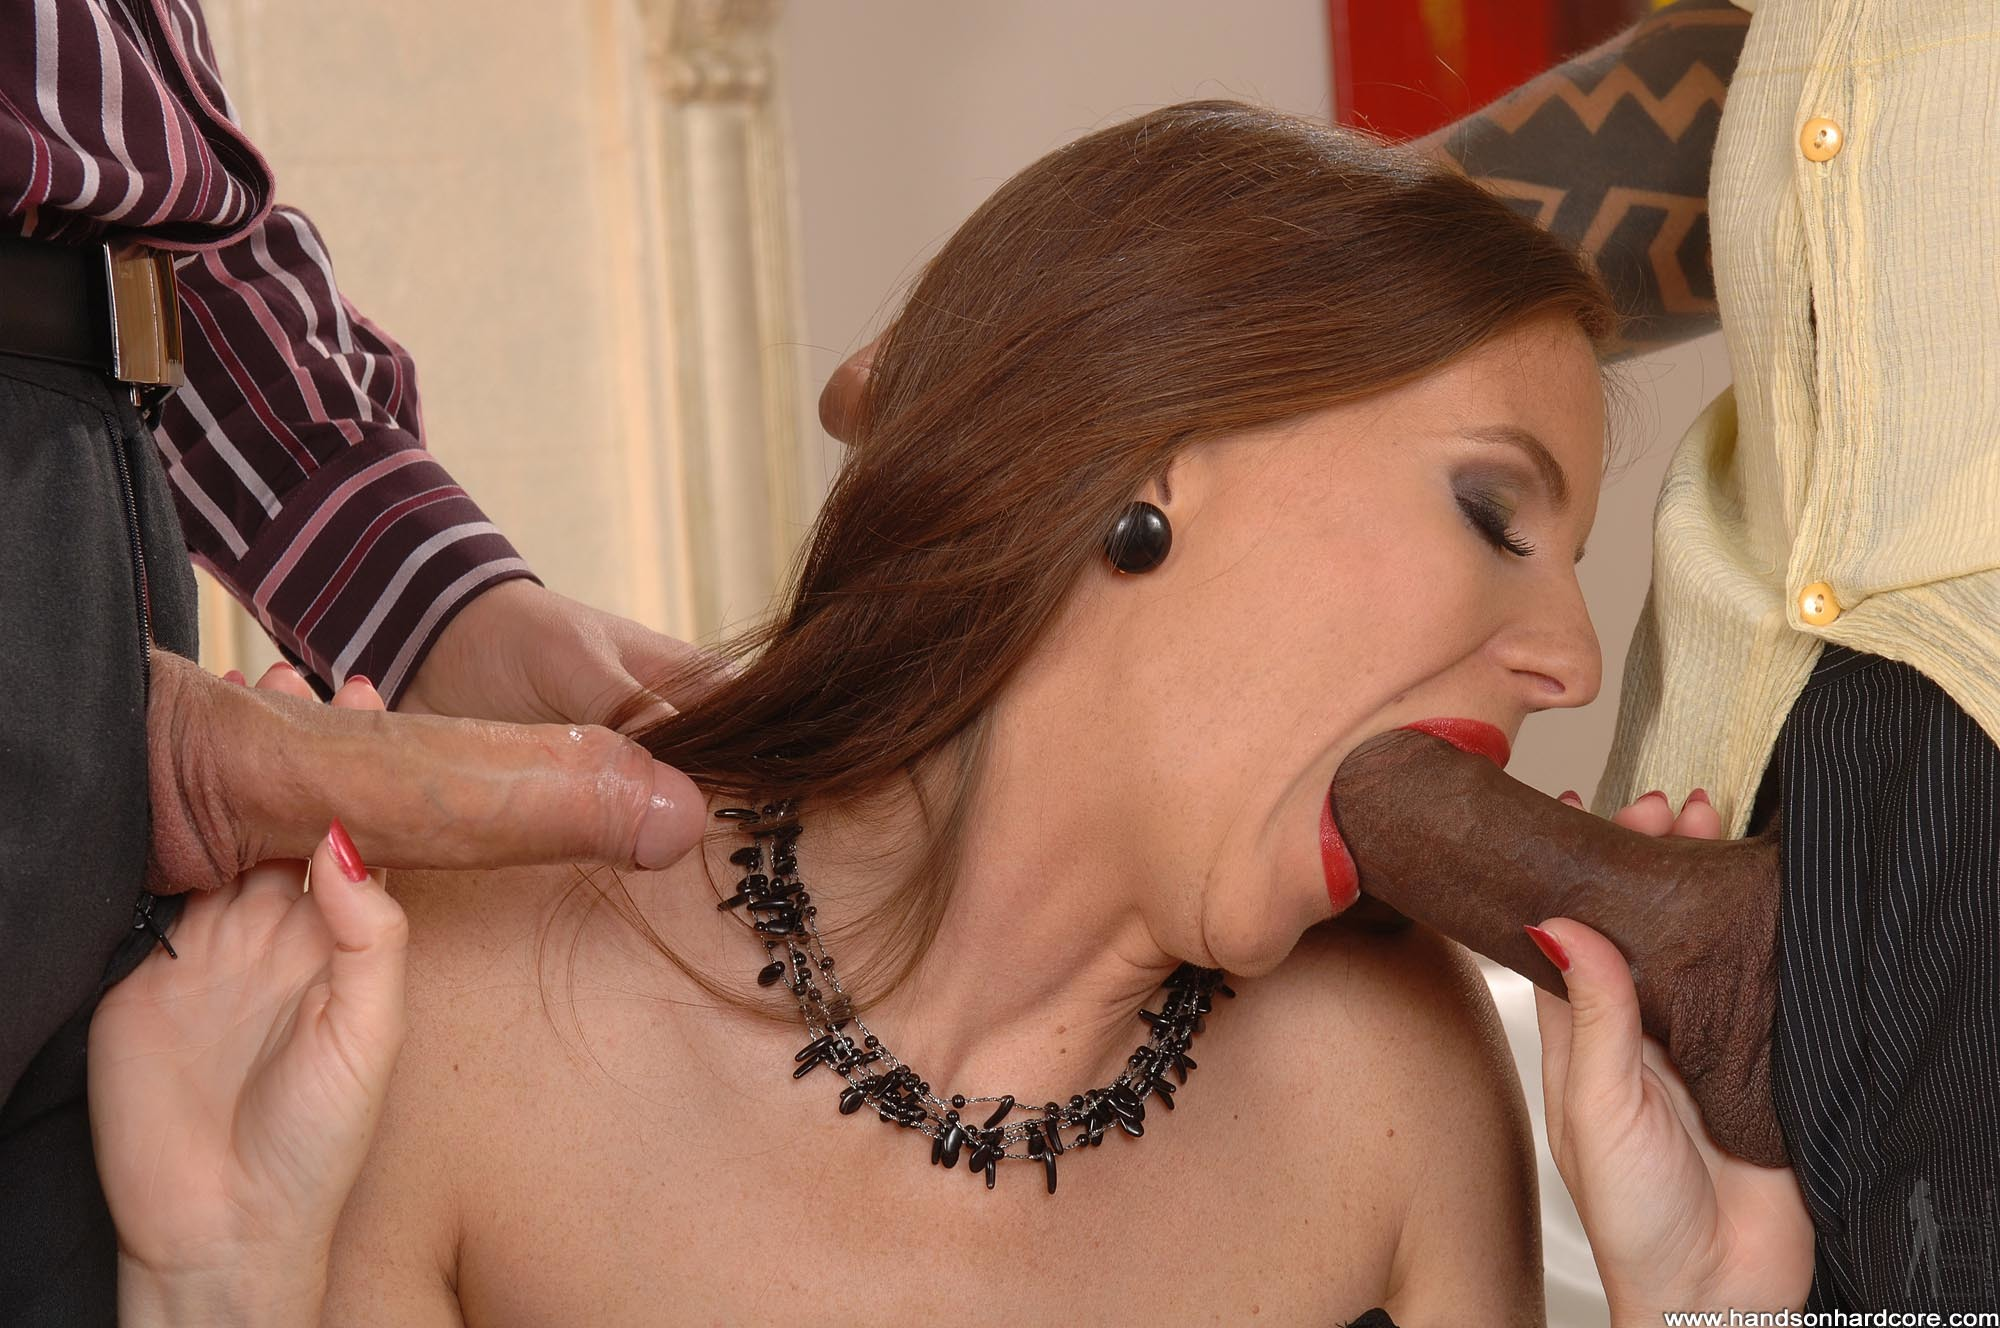 Ziya tong sucking cock